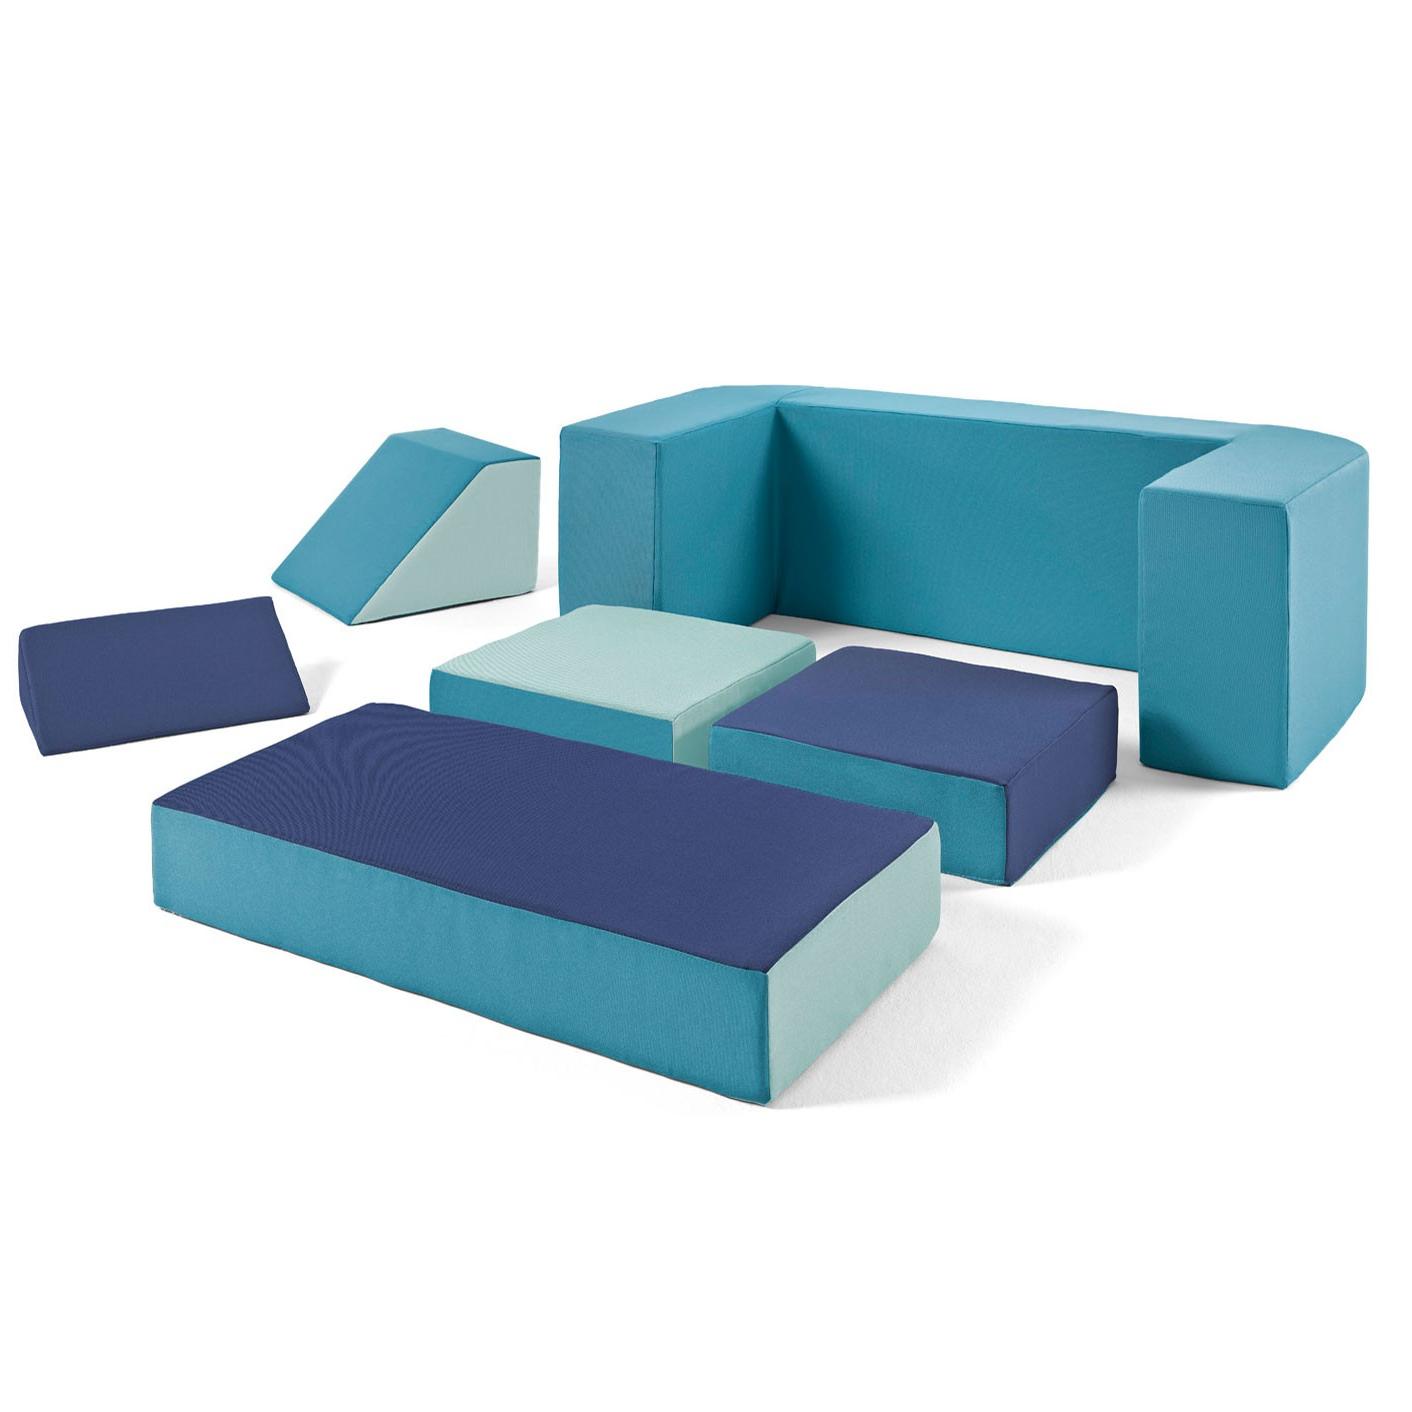 Sofas Infantiles Whdr sofà Para Nià Os Modular Puzzle Acqua Minimoi Minimoi